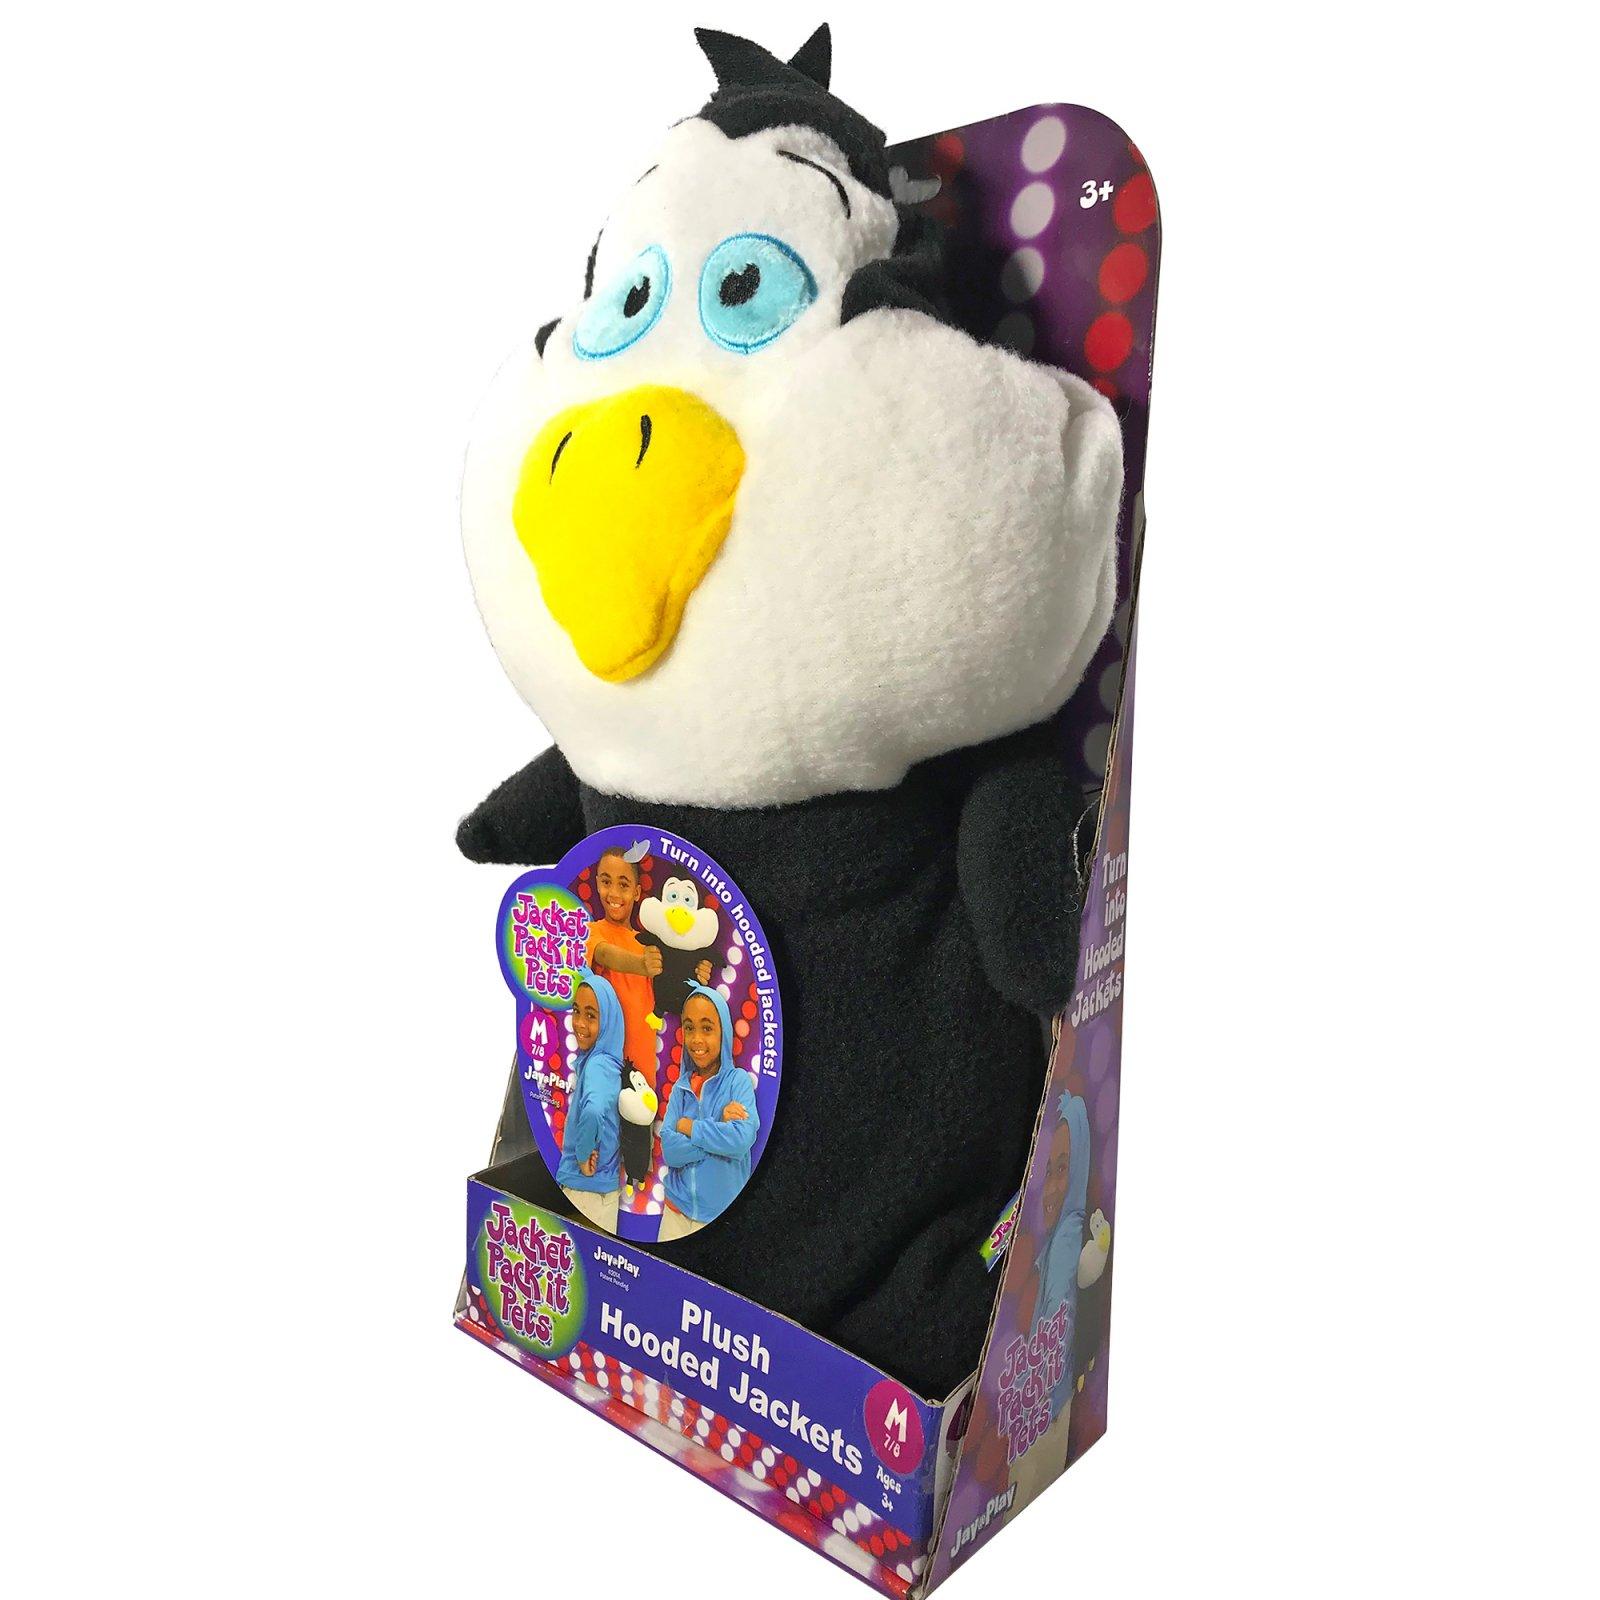 KidPlay Jacket Pack It Pets Penguin Plush Hooded Sweatshirt for Kids - Blue